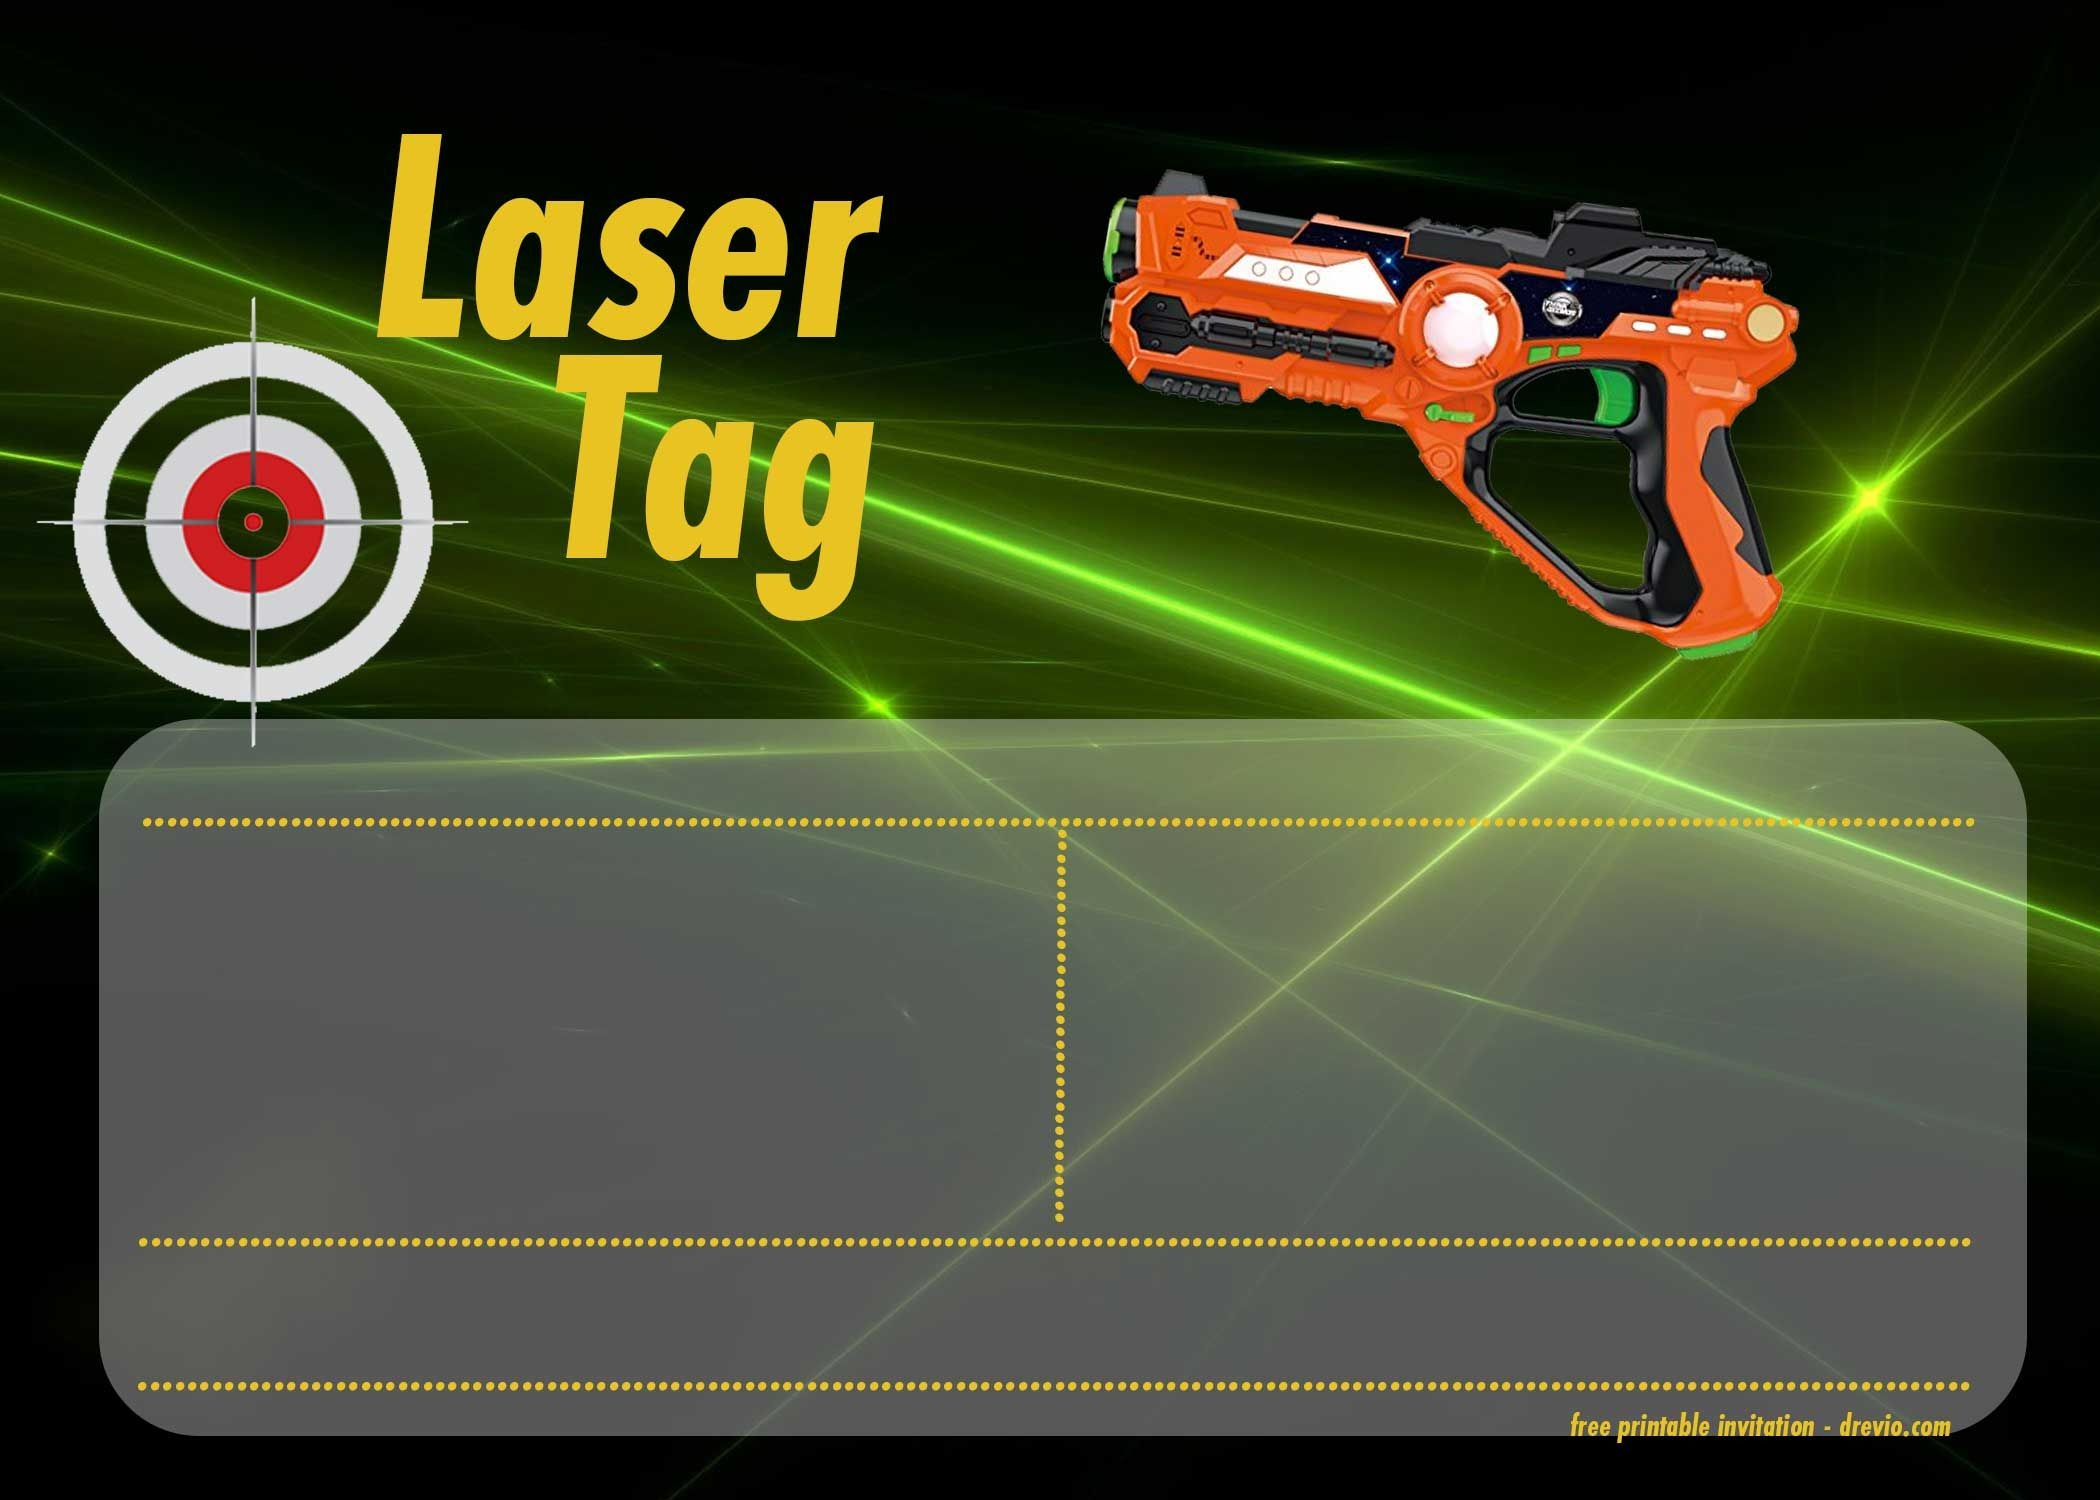 Free Printable Laser Tag Invitation Templates | Free Printable - Free Printable Laser Tag Invitation Template